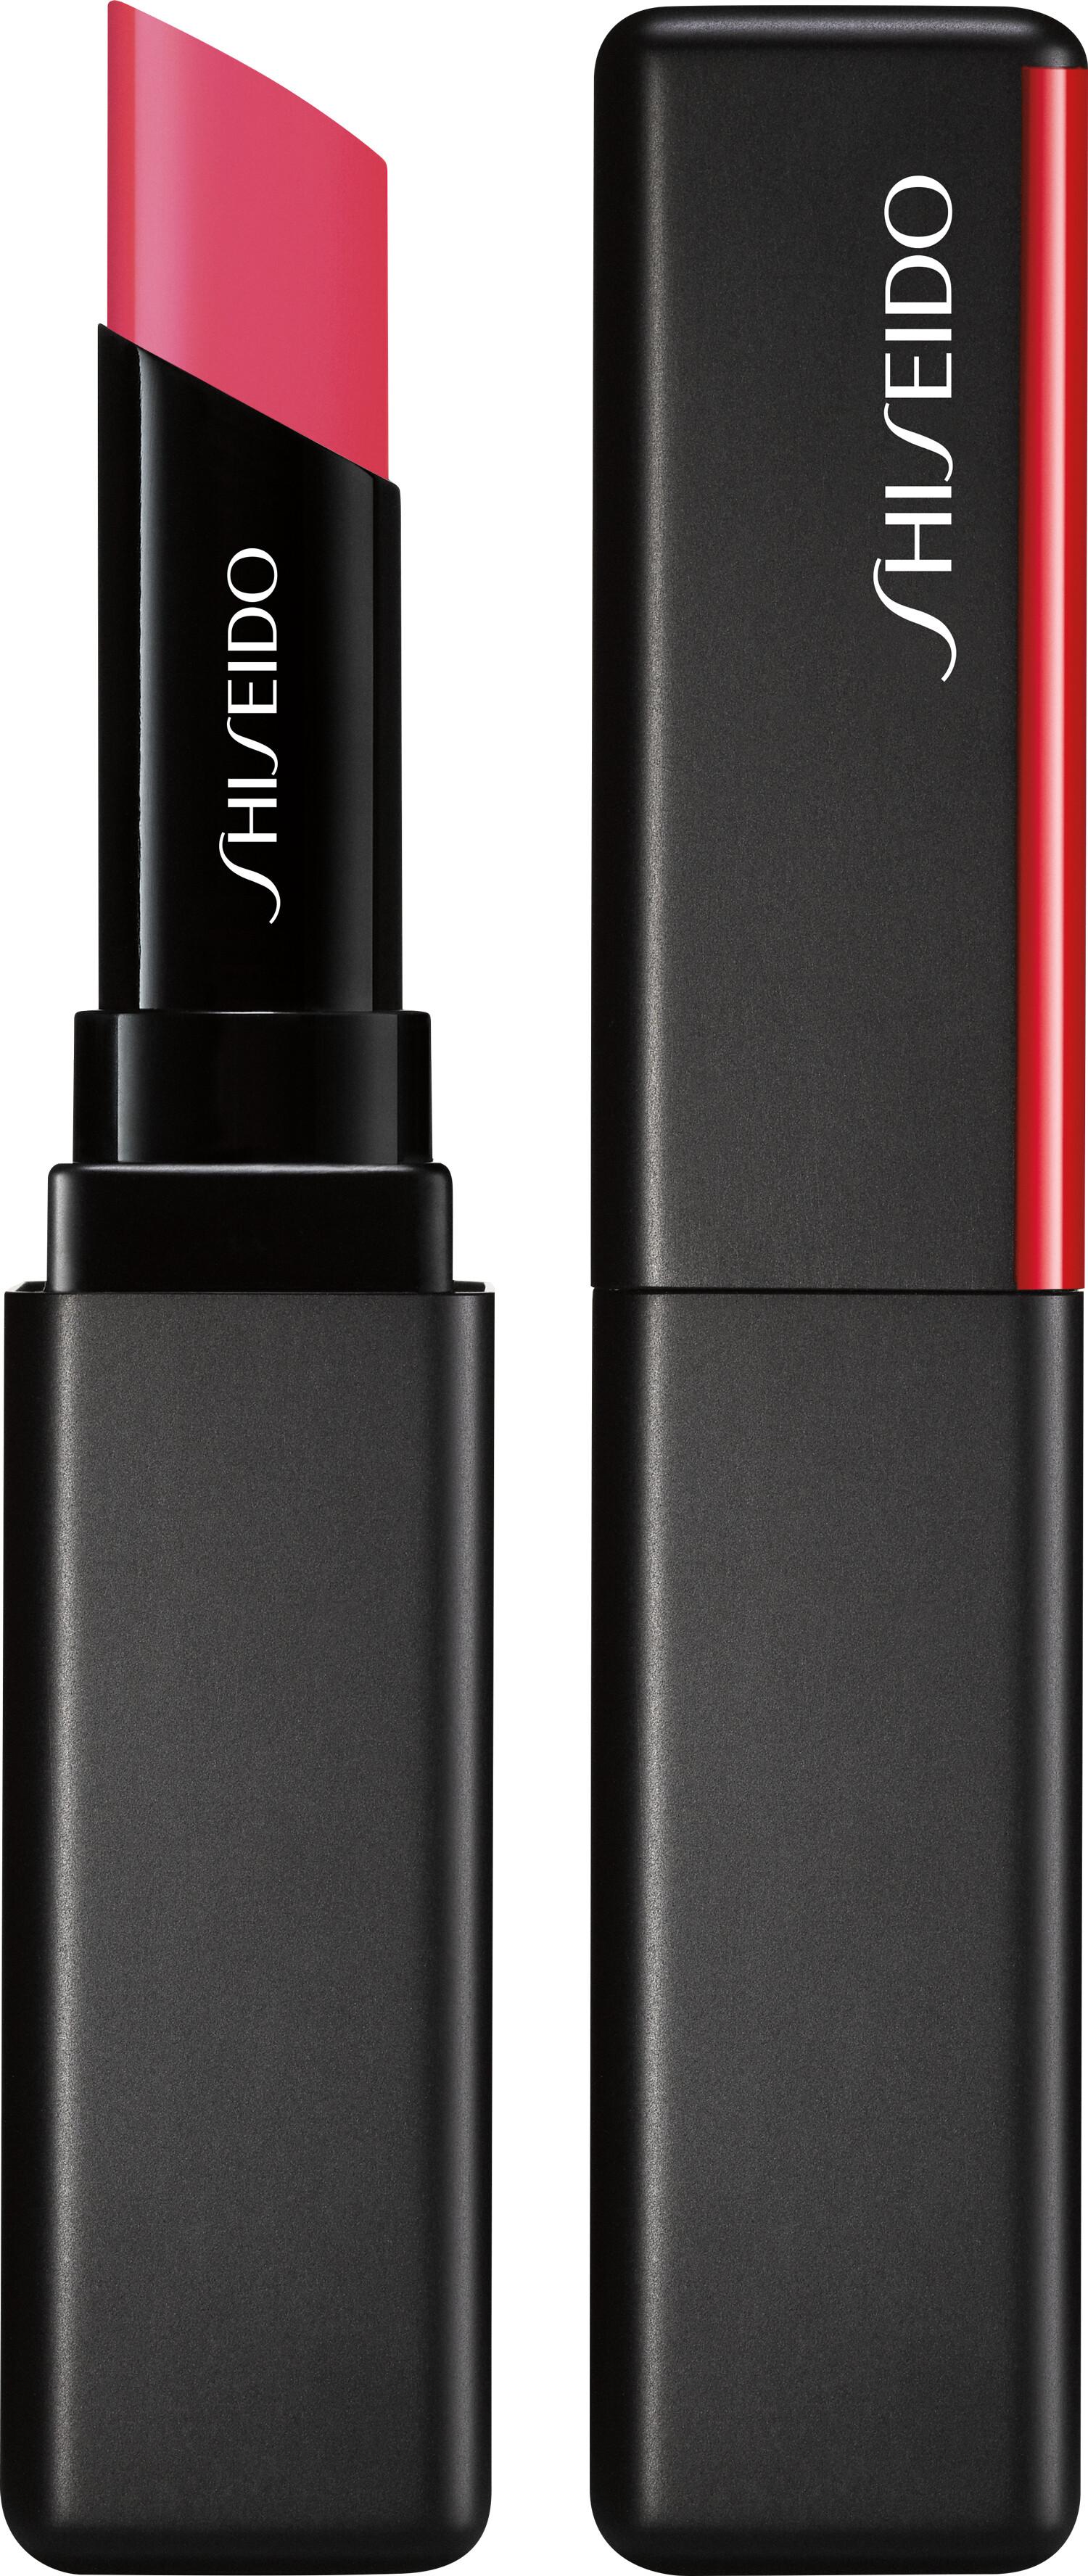 Shiseido VisionAiry Gel Lipstick 1.6g 213 - Neon Buzz